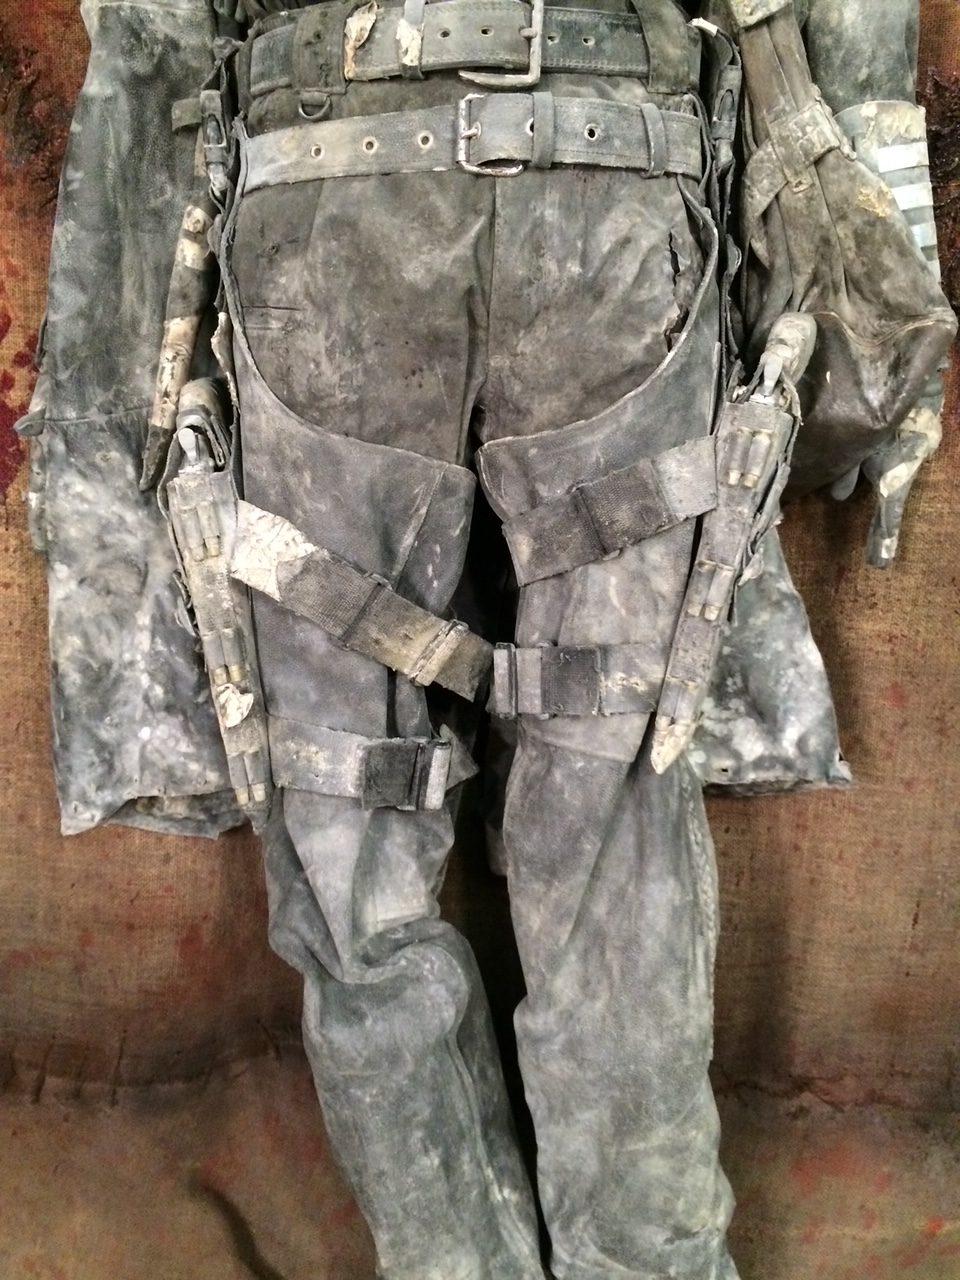 42 x 33 zombied pants